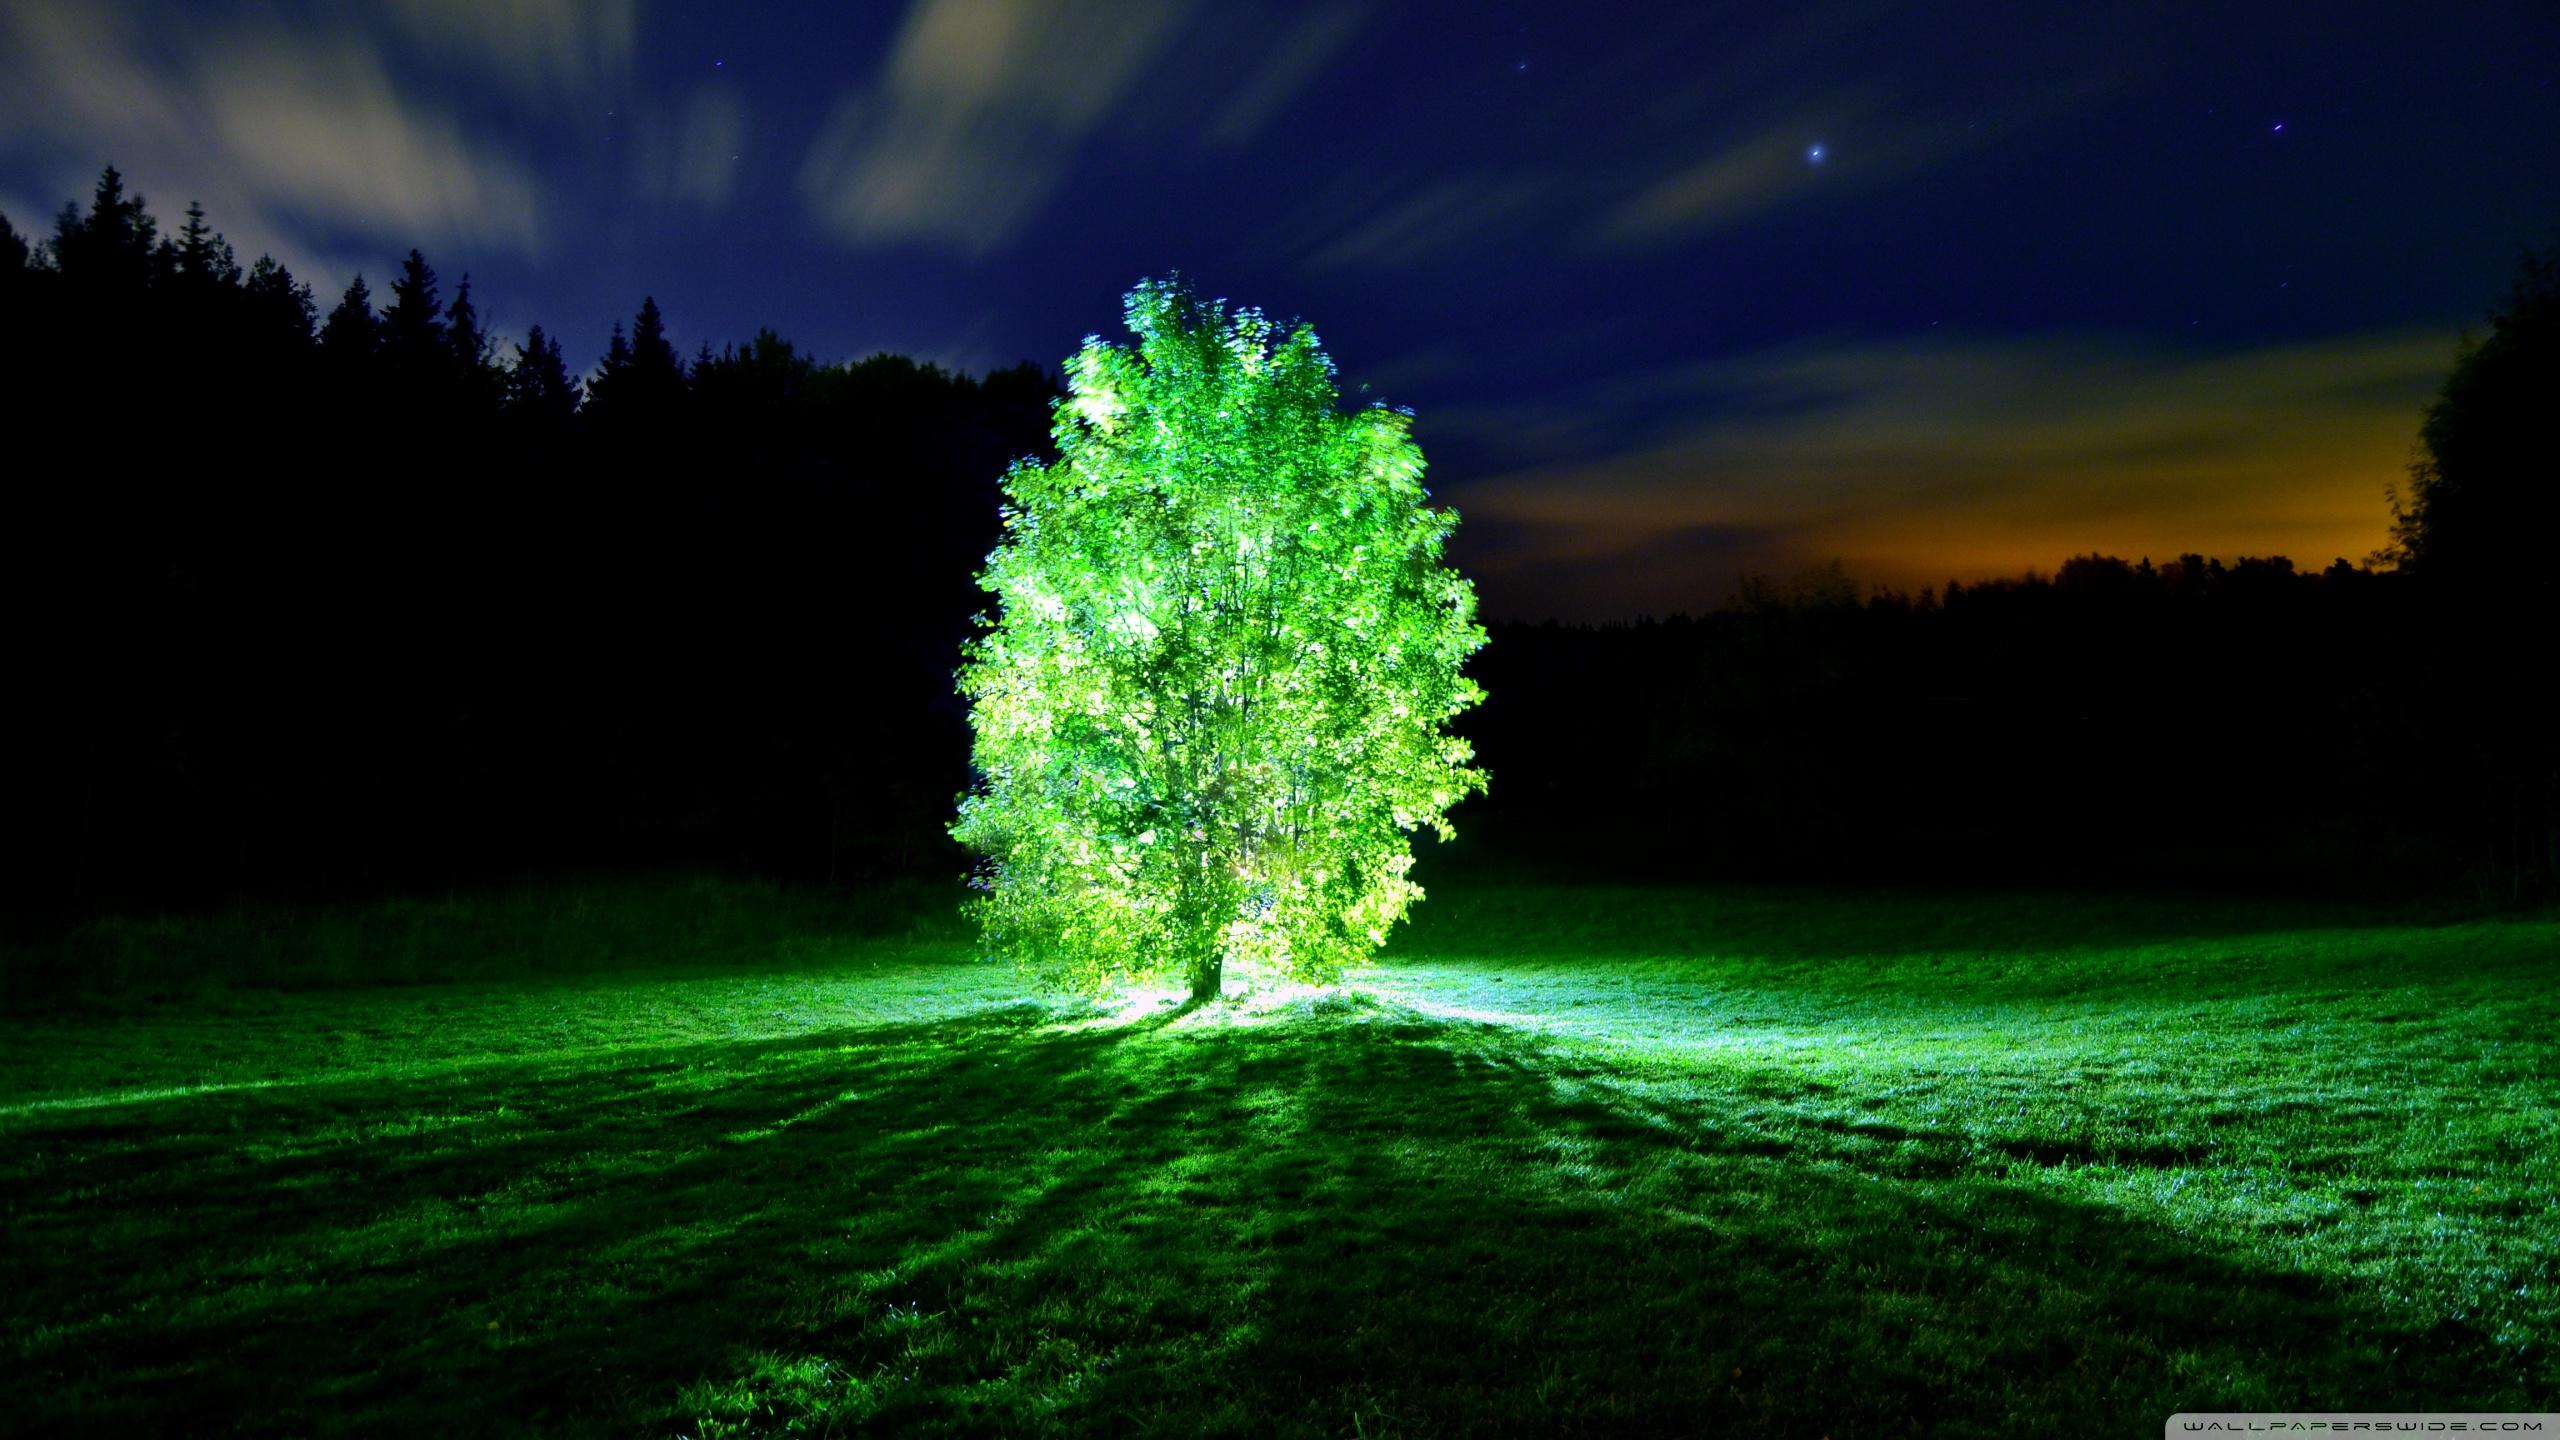 glowing_tree-wallpaper-2560x1440